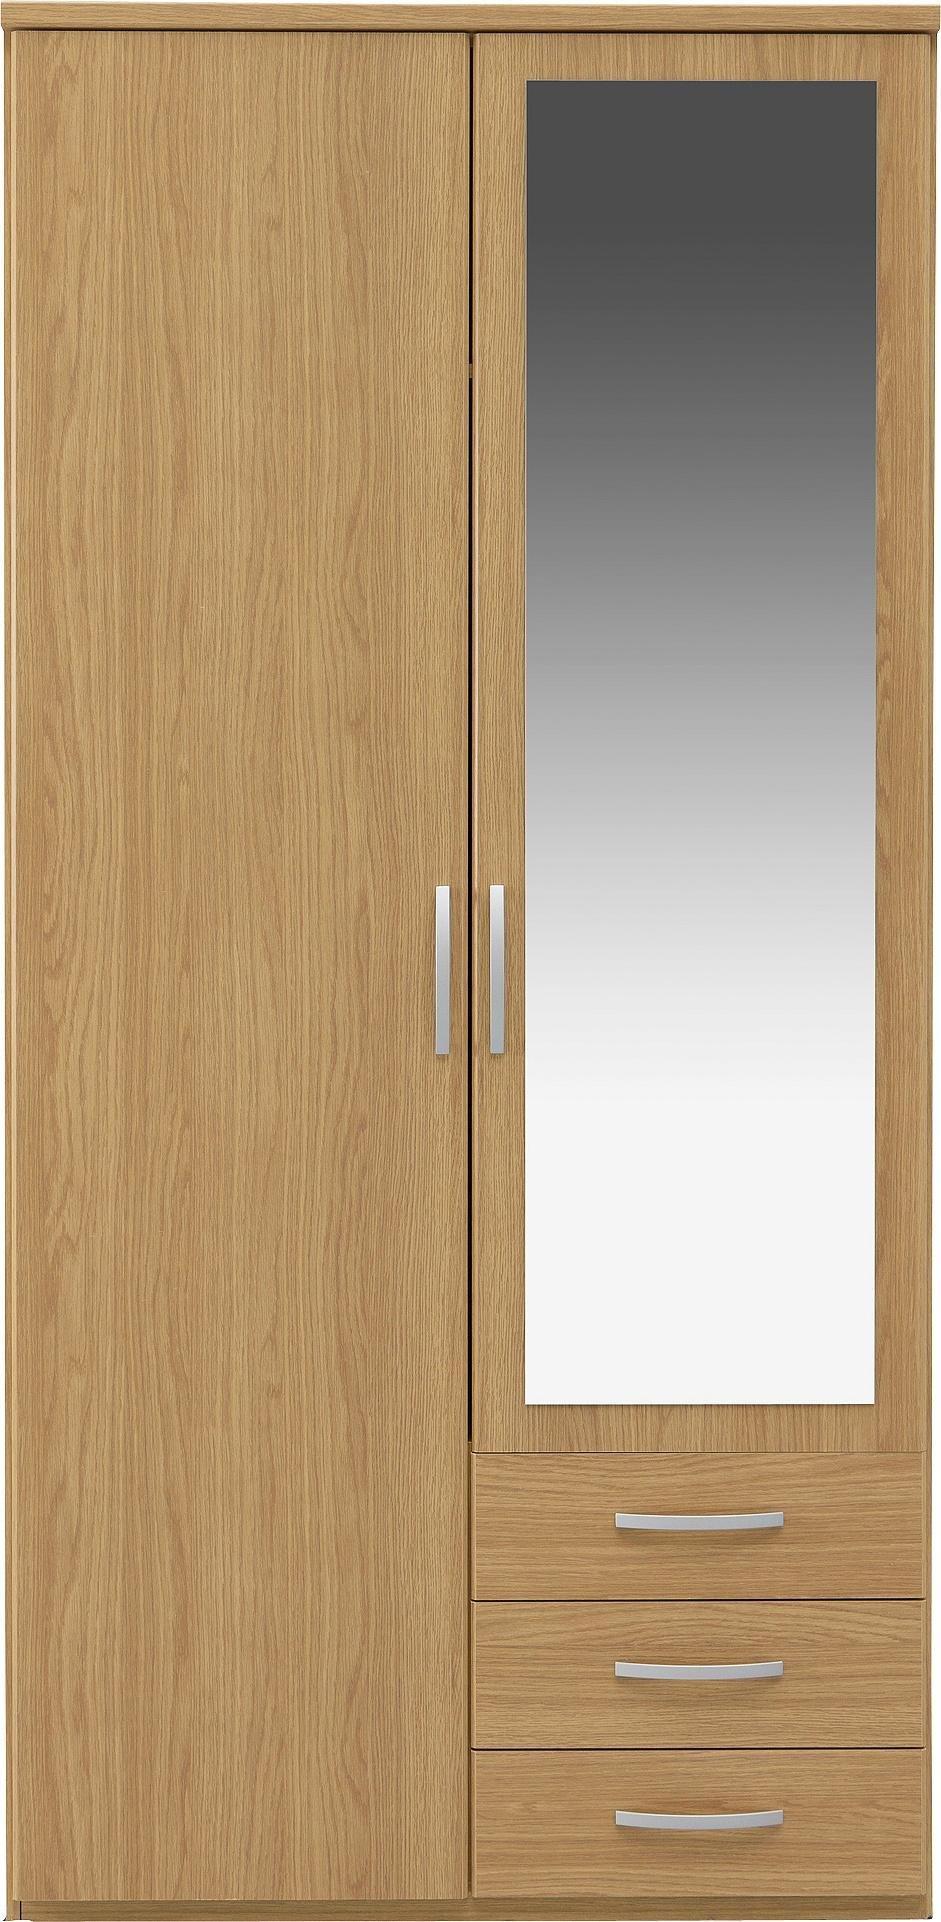 mirror wardrobe. collection new hallingford 2 dr 3 drw mirror wardrobe - oak i